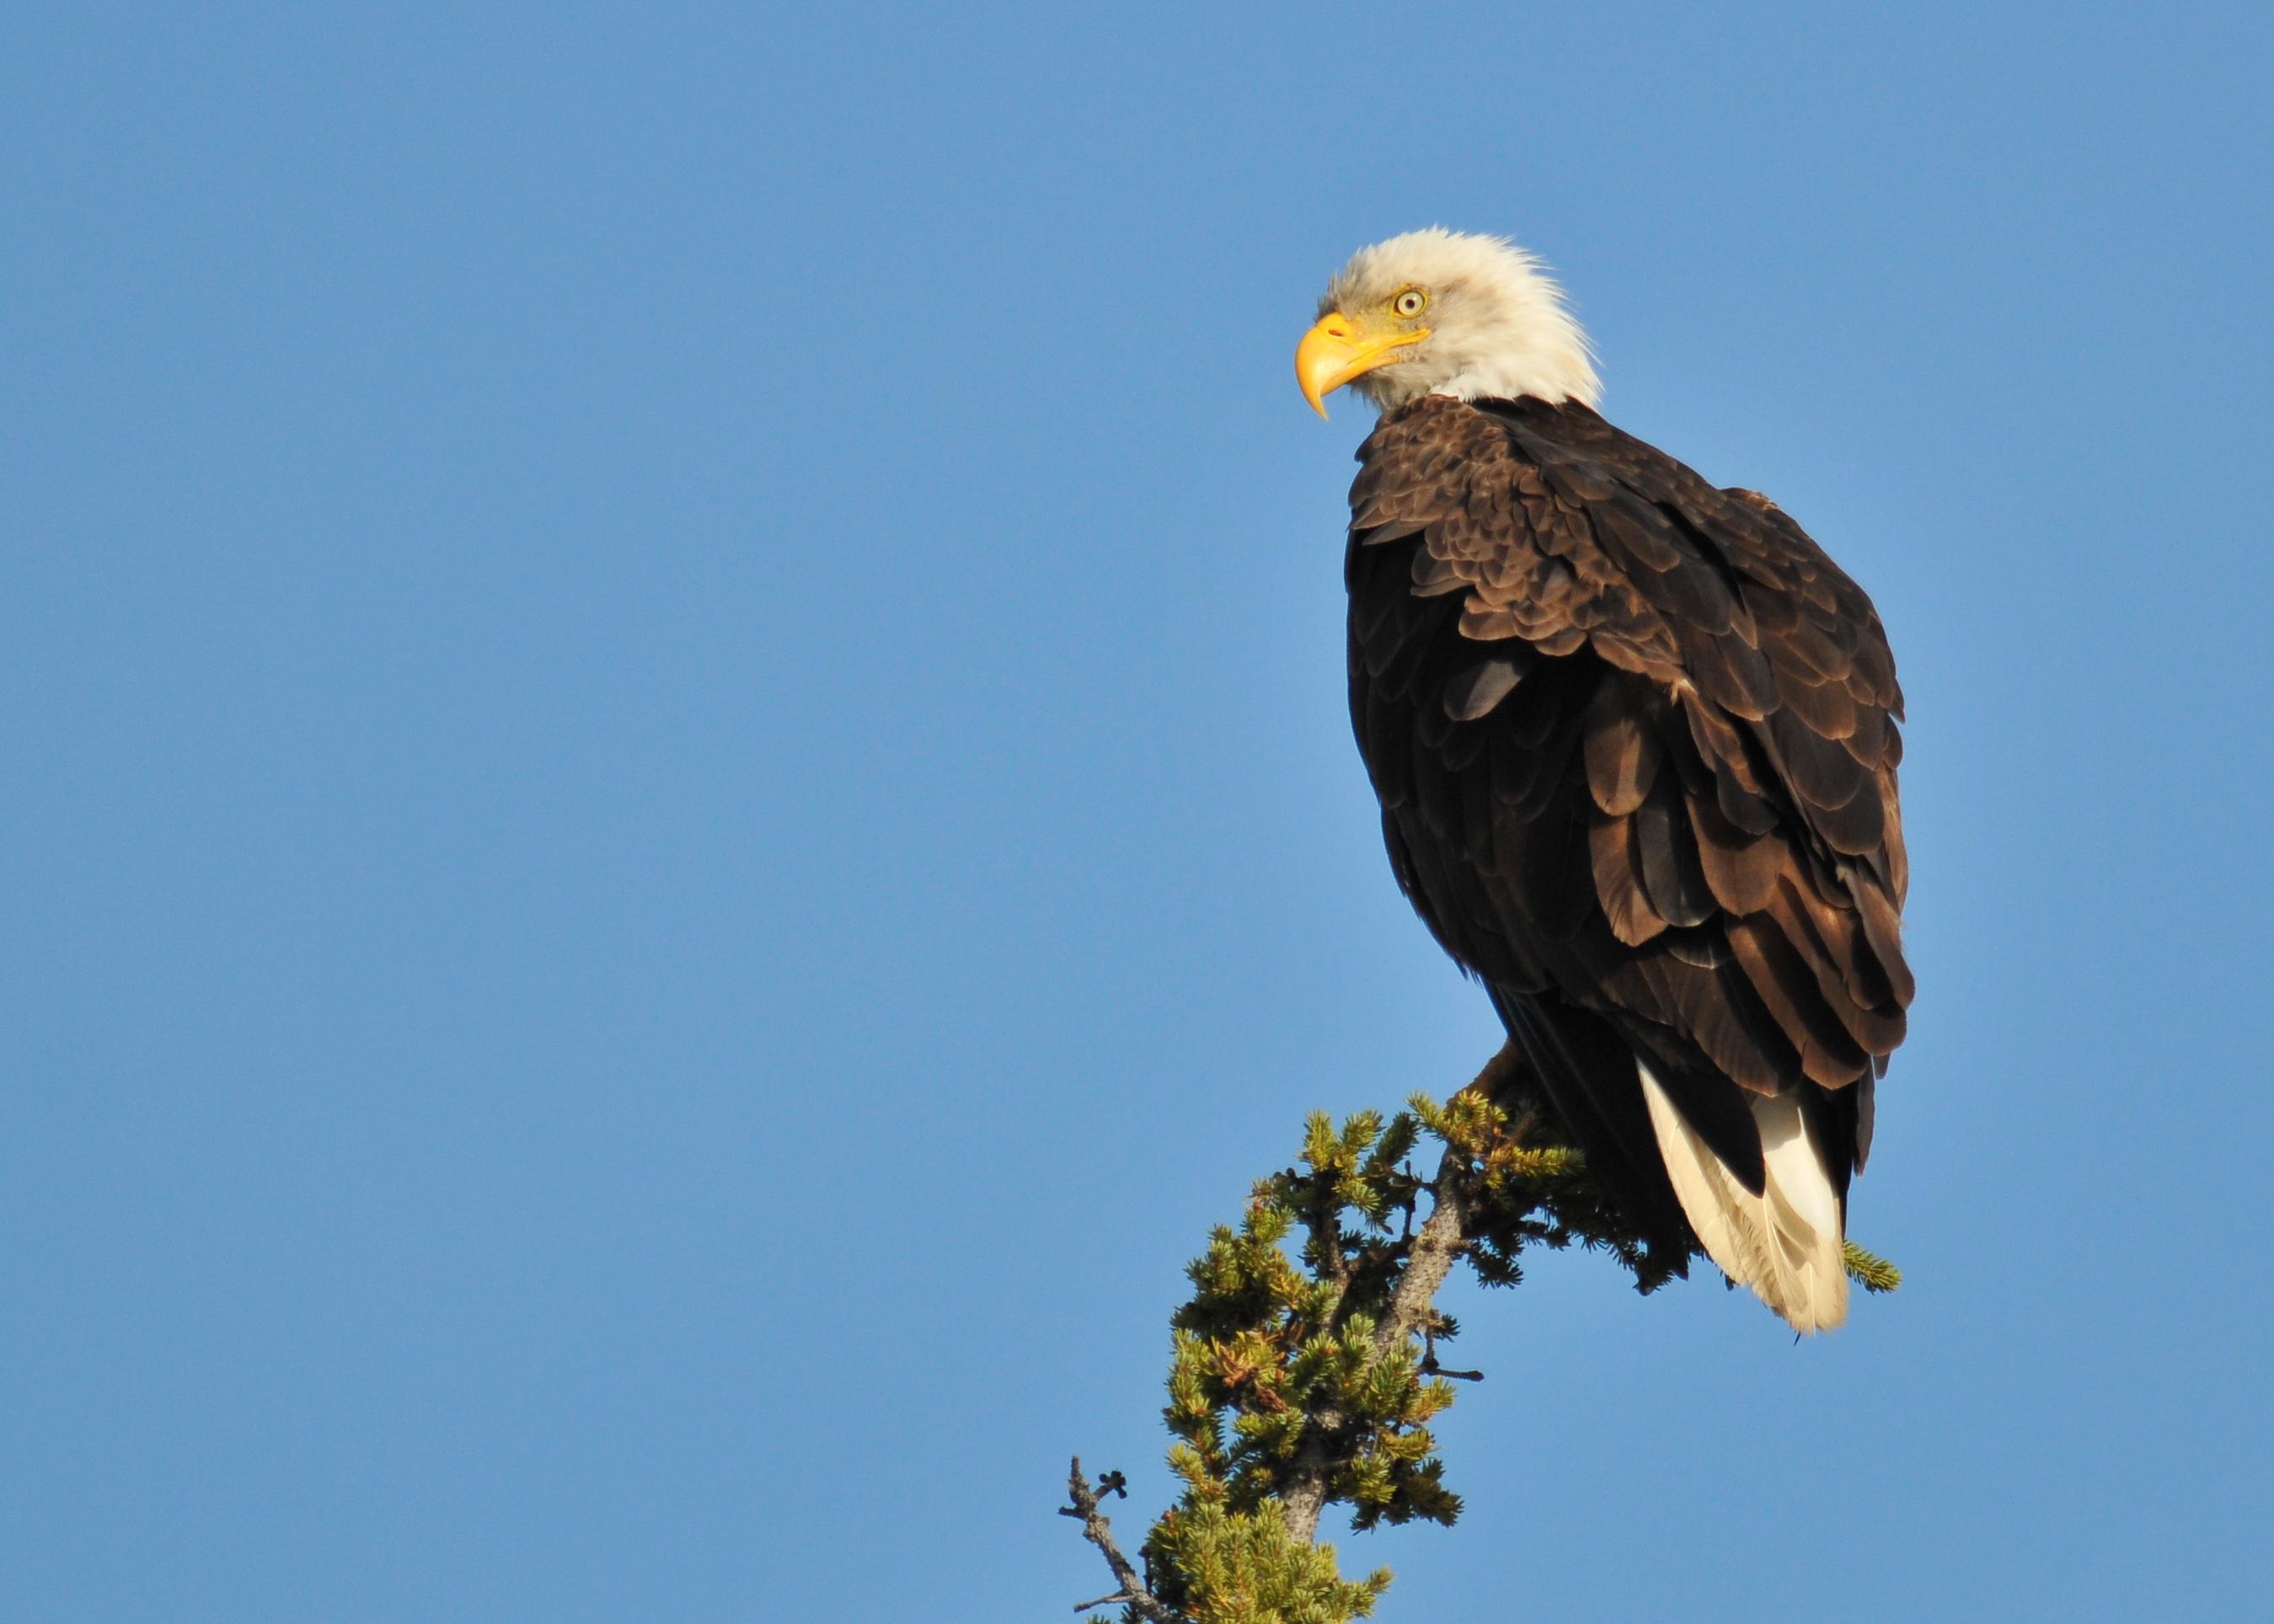 bald eagles The greek interpretation for the bald eagle's scientific name (haliaeetus leucocephalus) is sea eagle with white head.